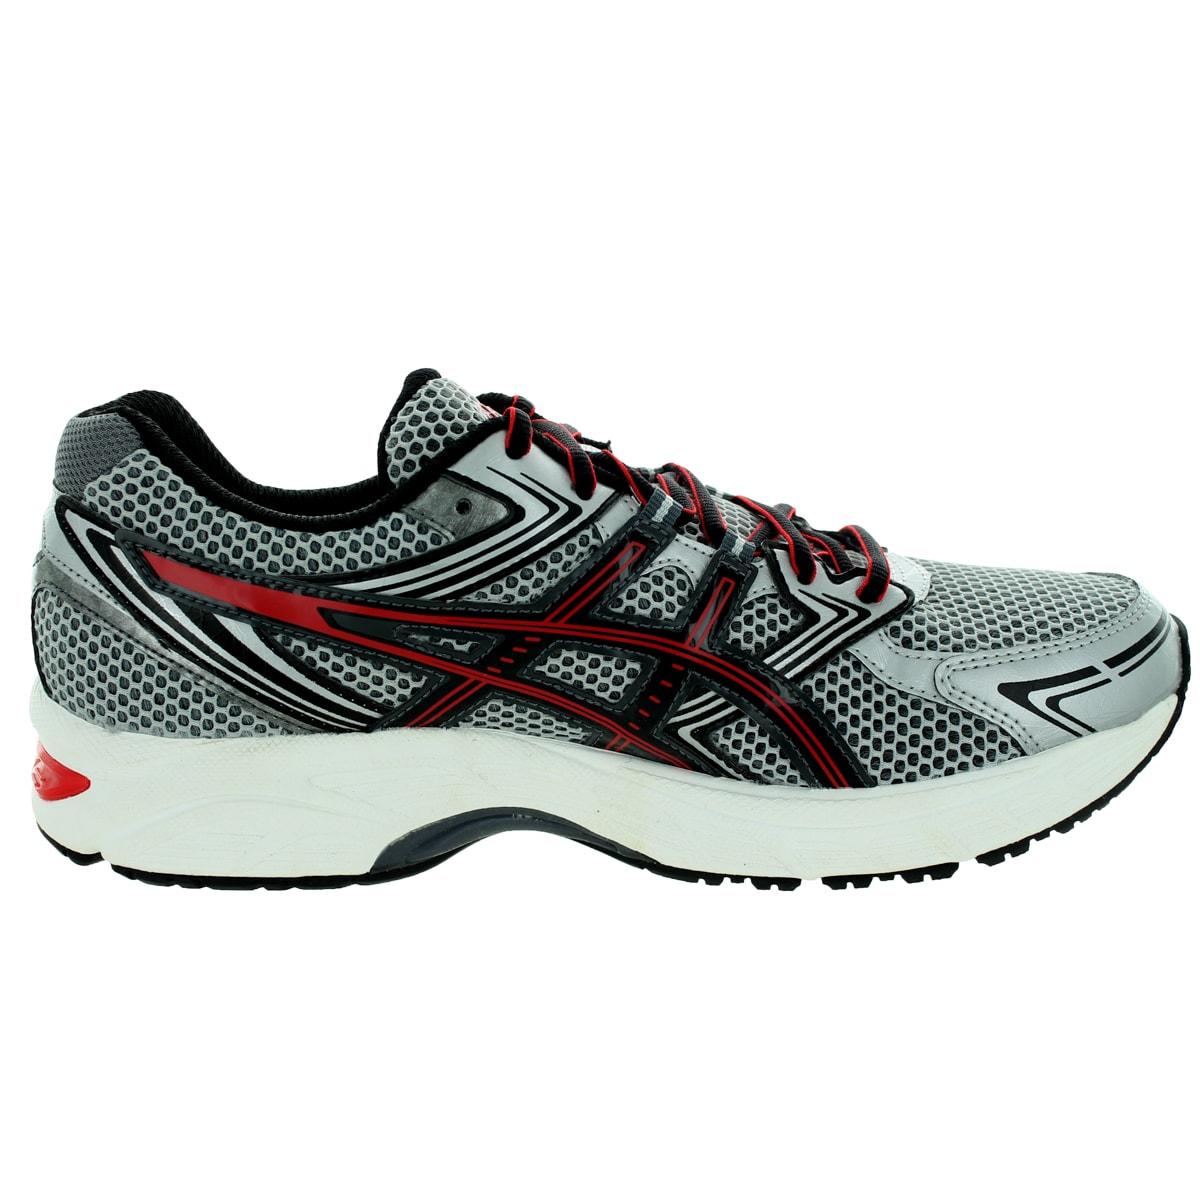 Asics Running Shoes Red Gel Equation 7 Lightning Onyx Mens